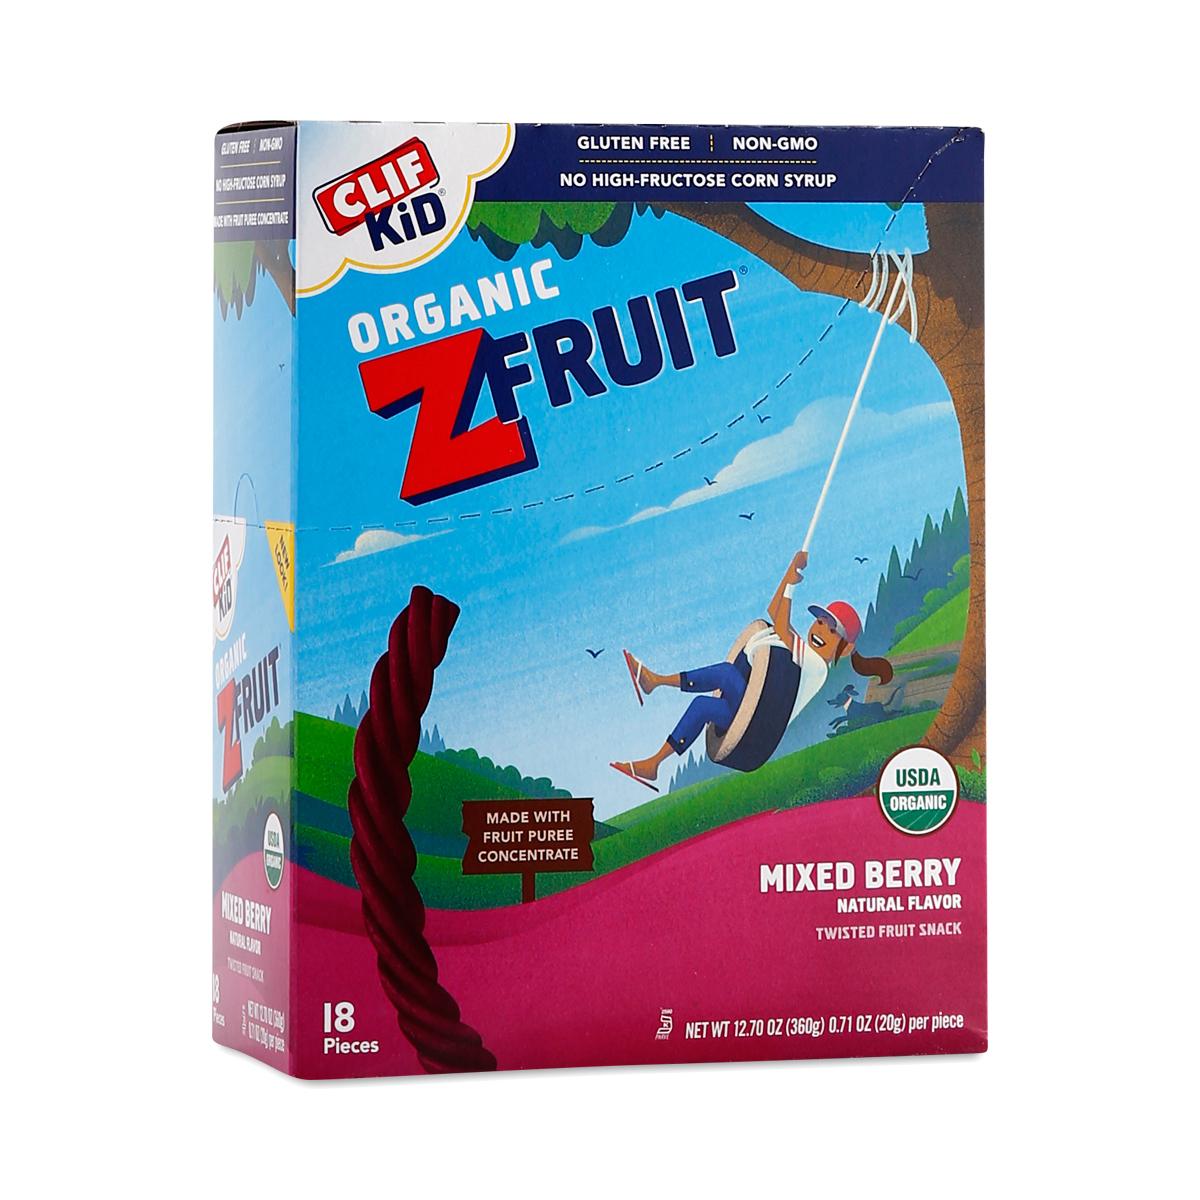 Clif Bar Clif Kid ZFruit Mixed Berry Snack Eighteen 0.7 oz strips